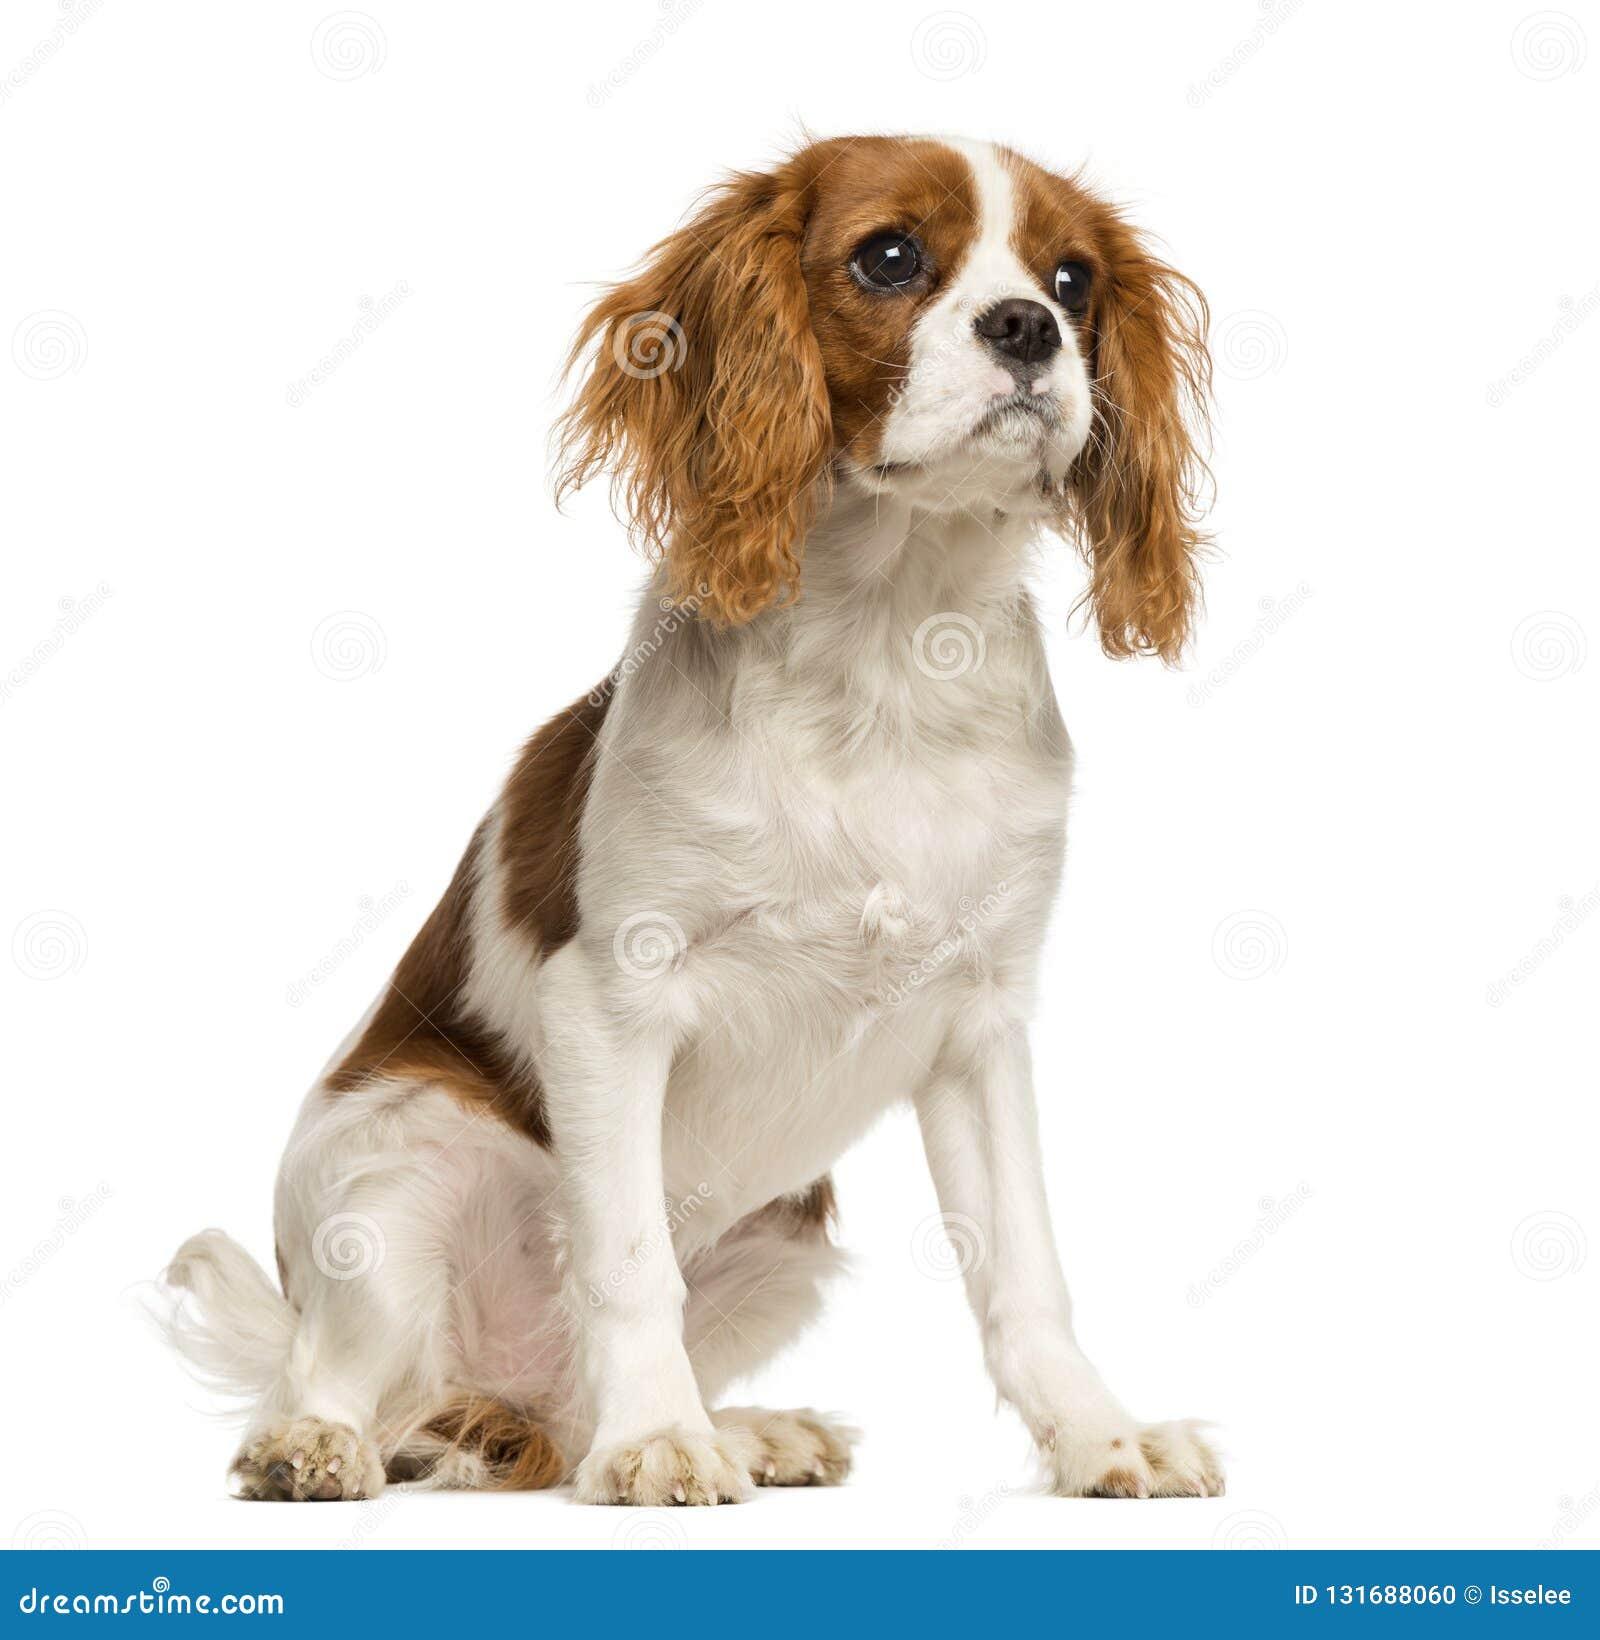 Perrito arrogante de rey Charles Spaniel, sentada, 5 meses